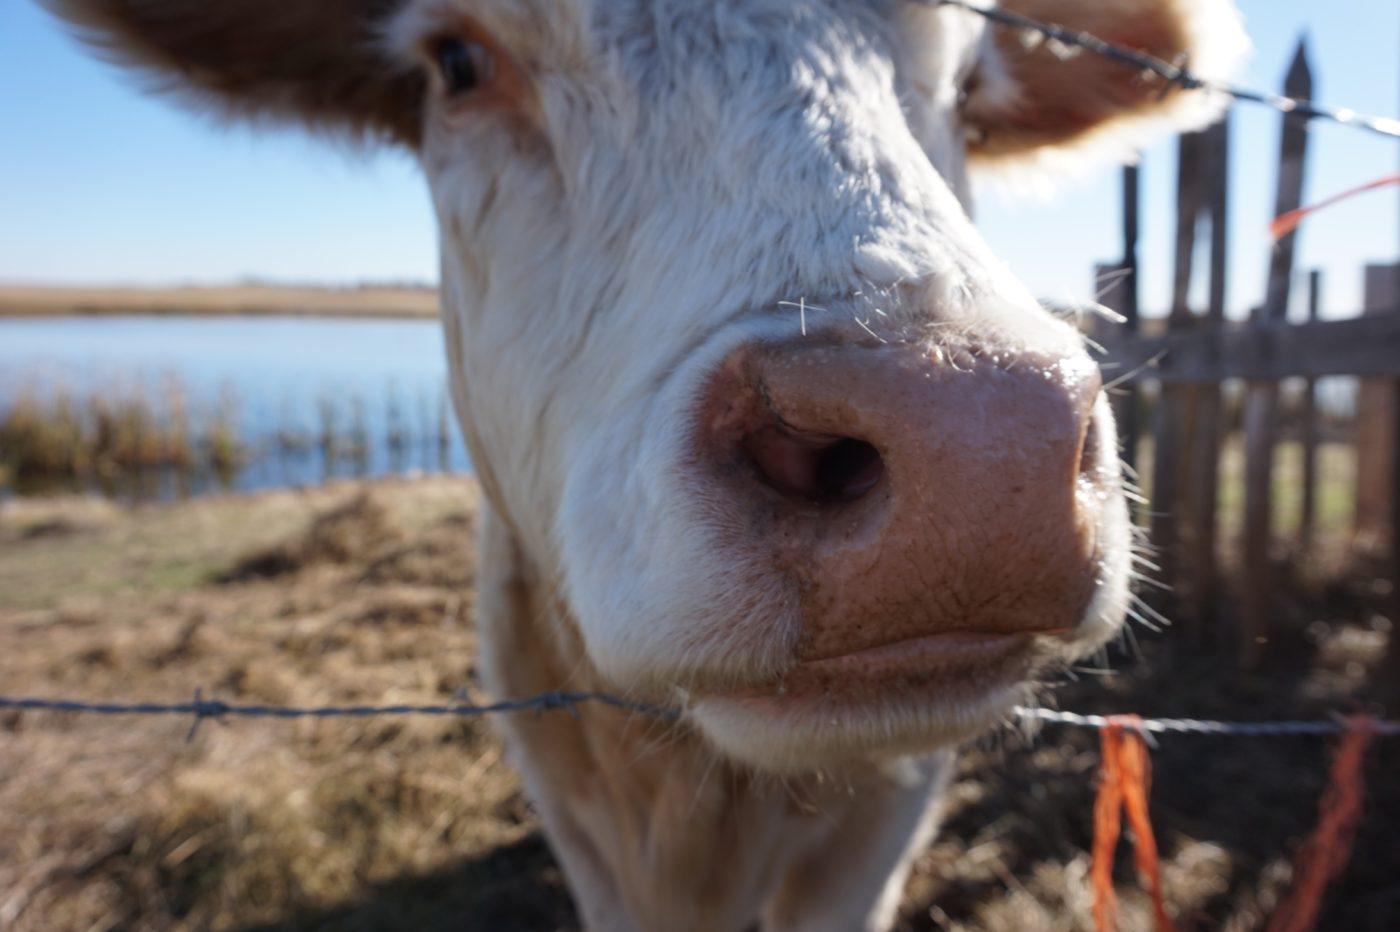 How Cow I help you?